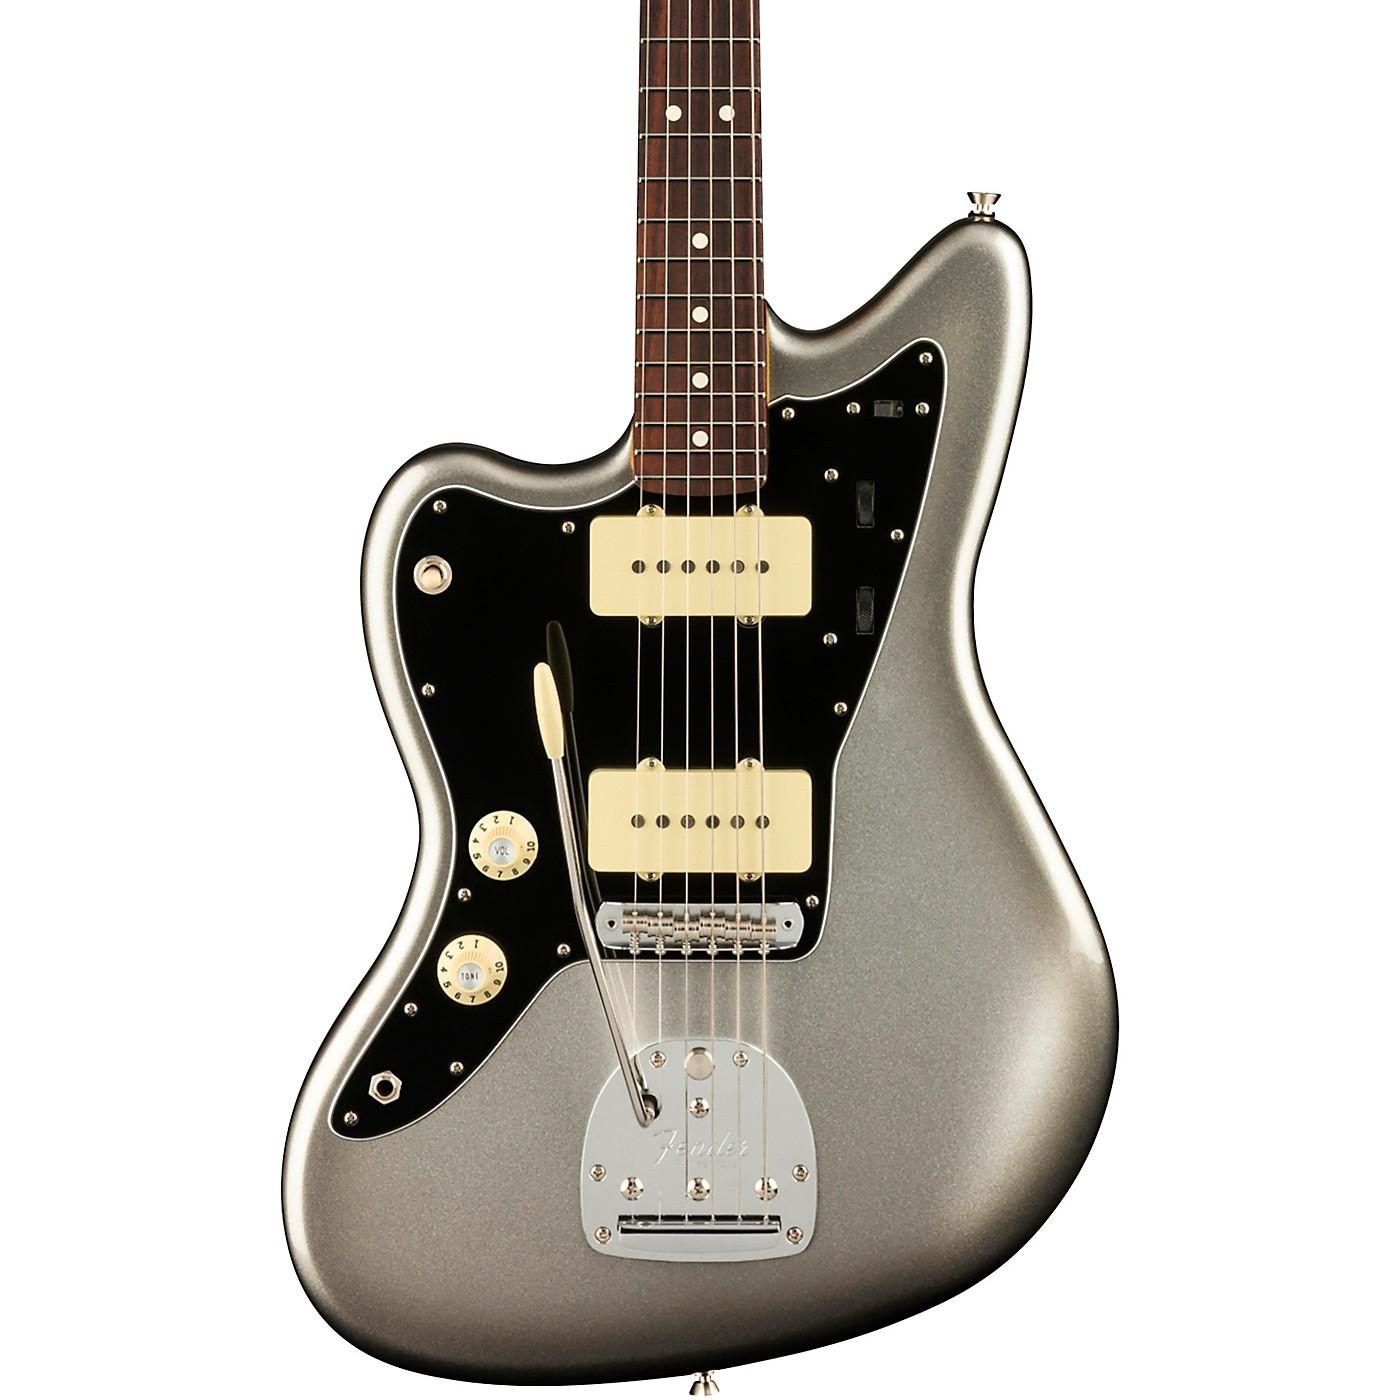 Fender American Professional II Jazzmaster Rosewood Fingerboard Left-Handed Electric Guitar thumbnail